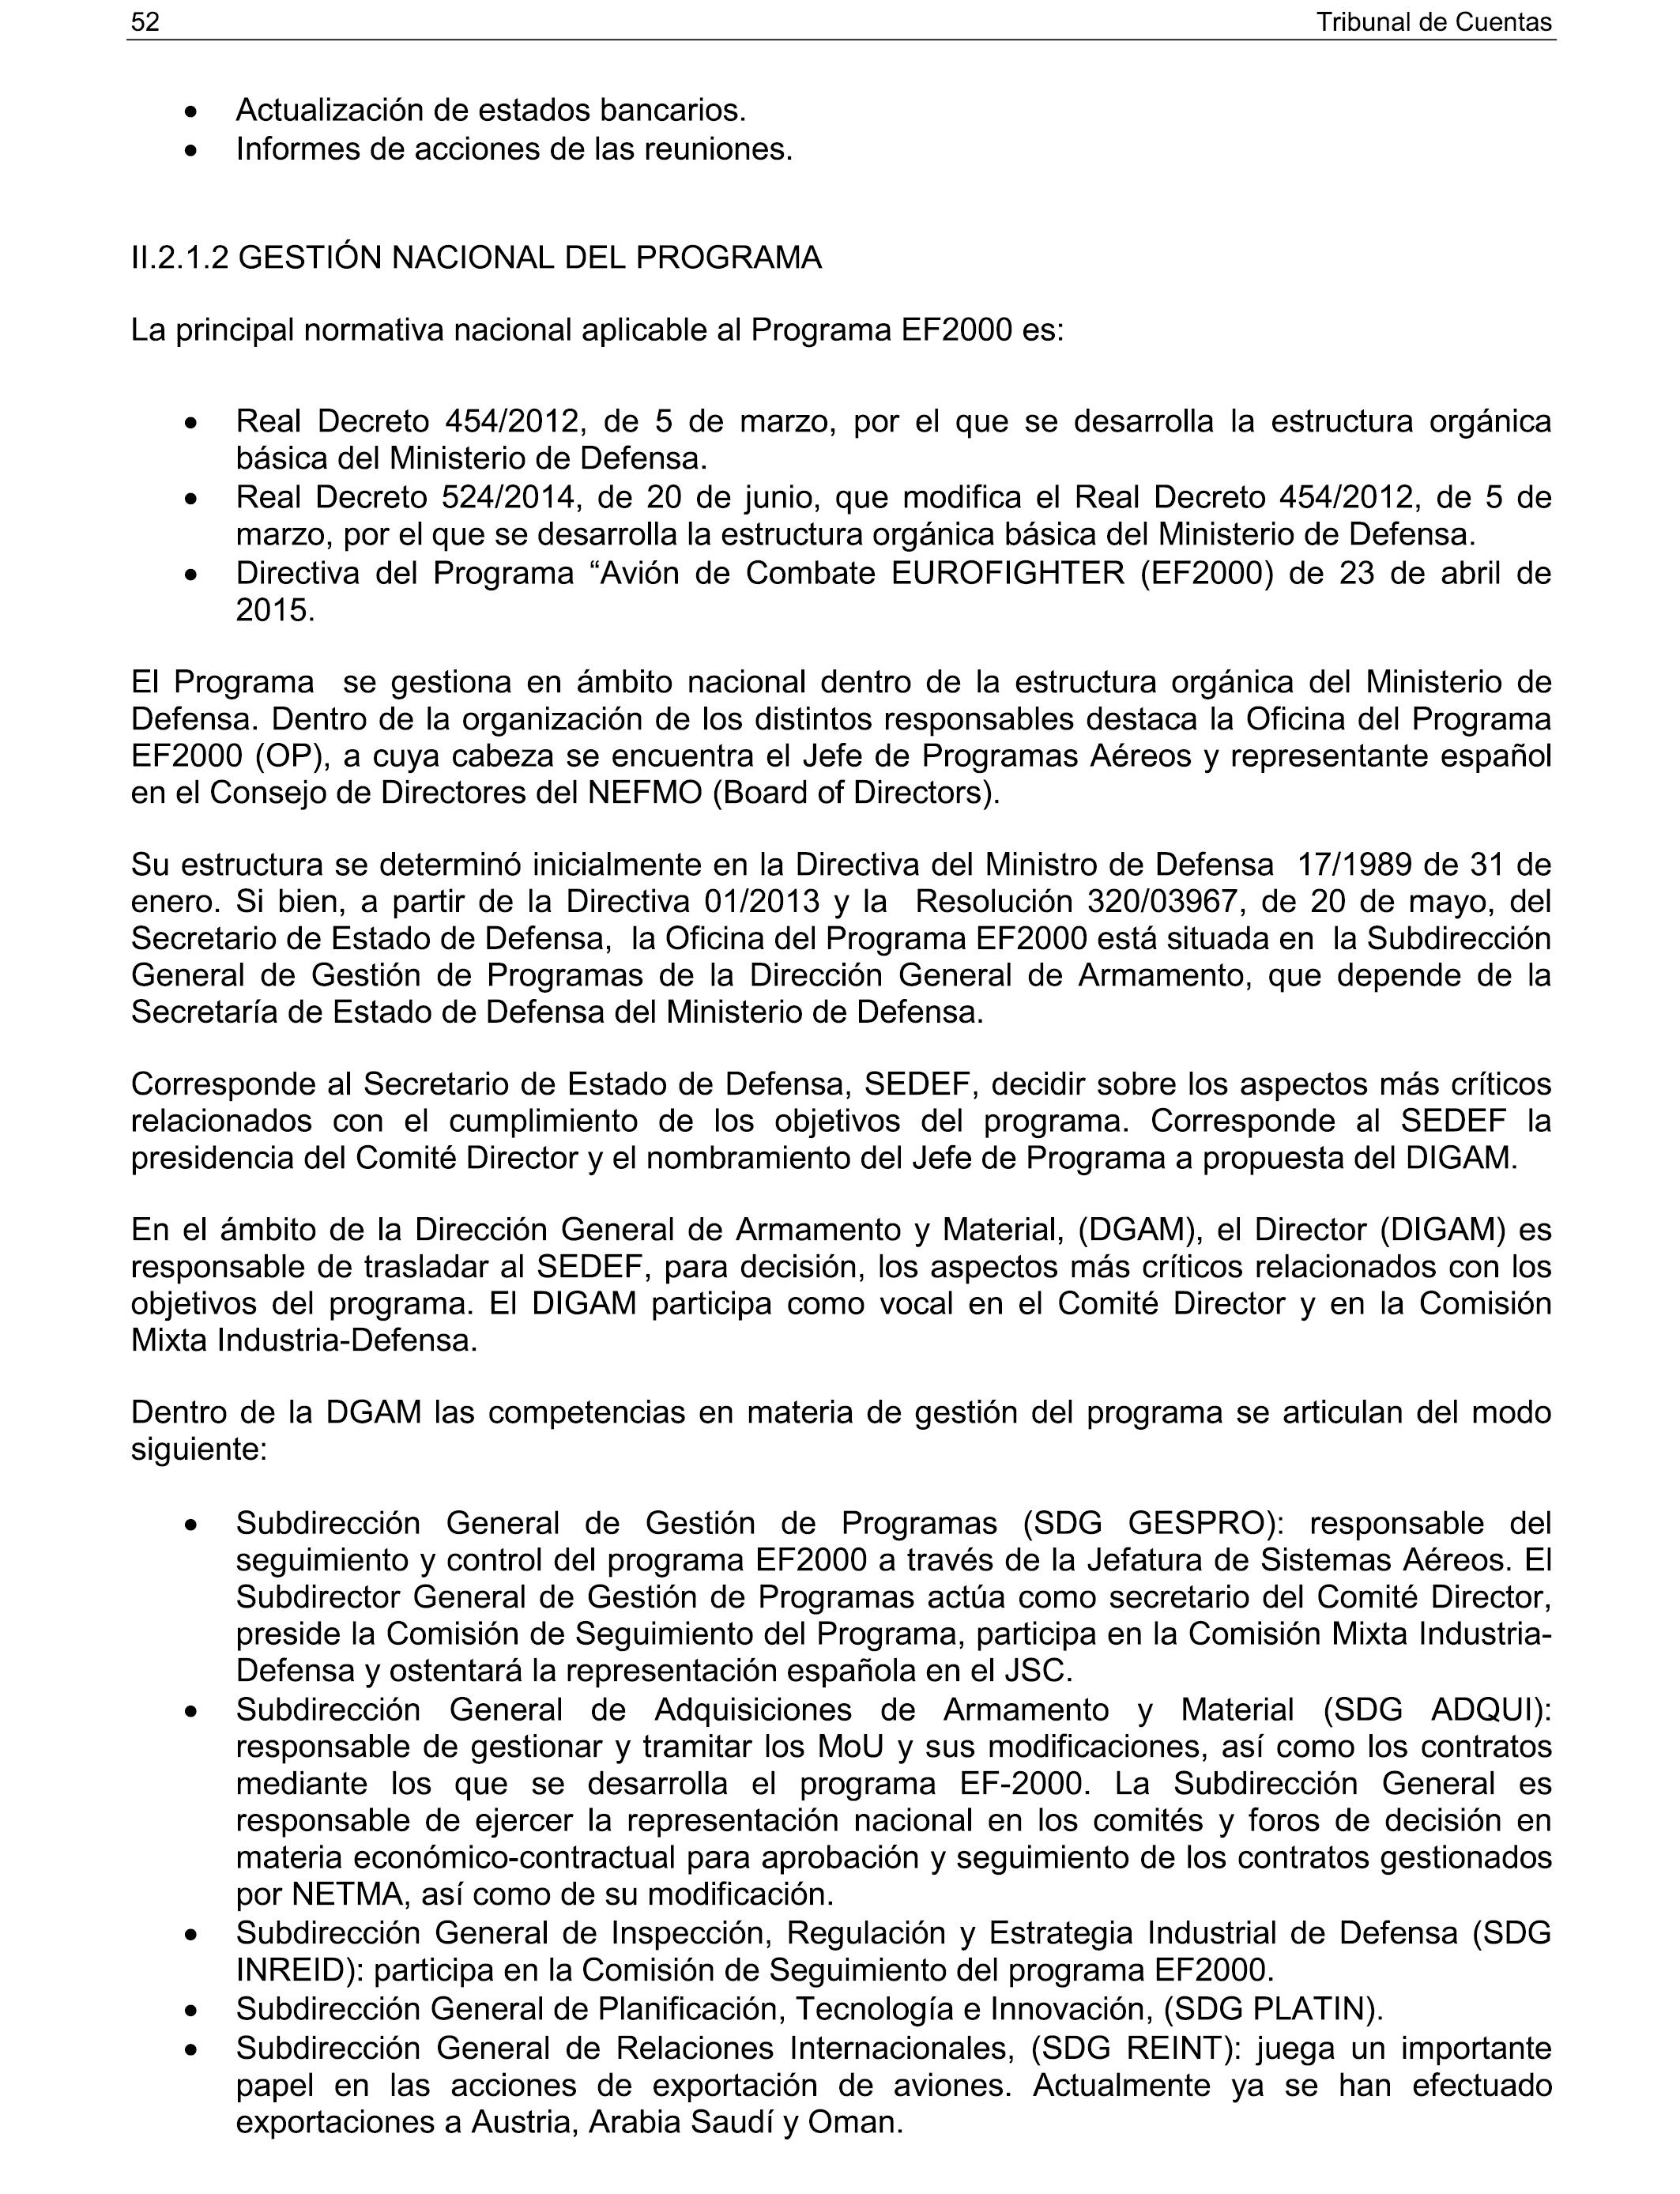 BOE.es - Documento BOE-A-2017-7190